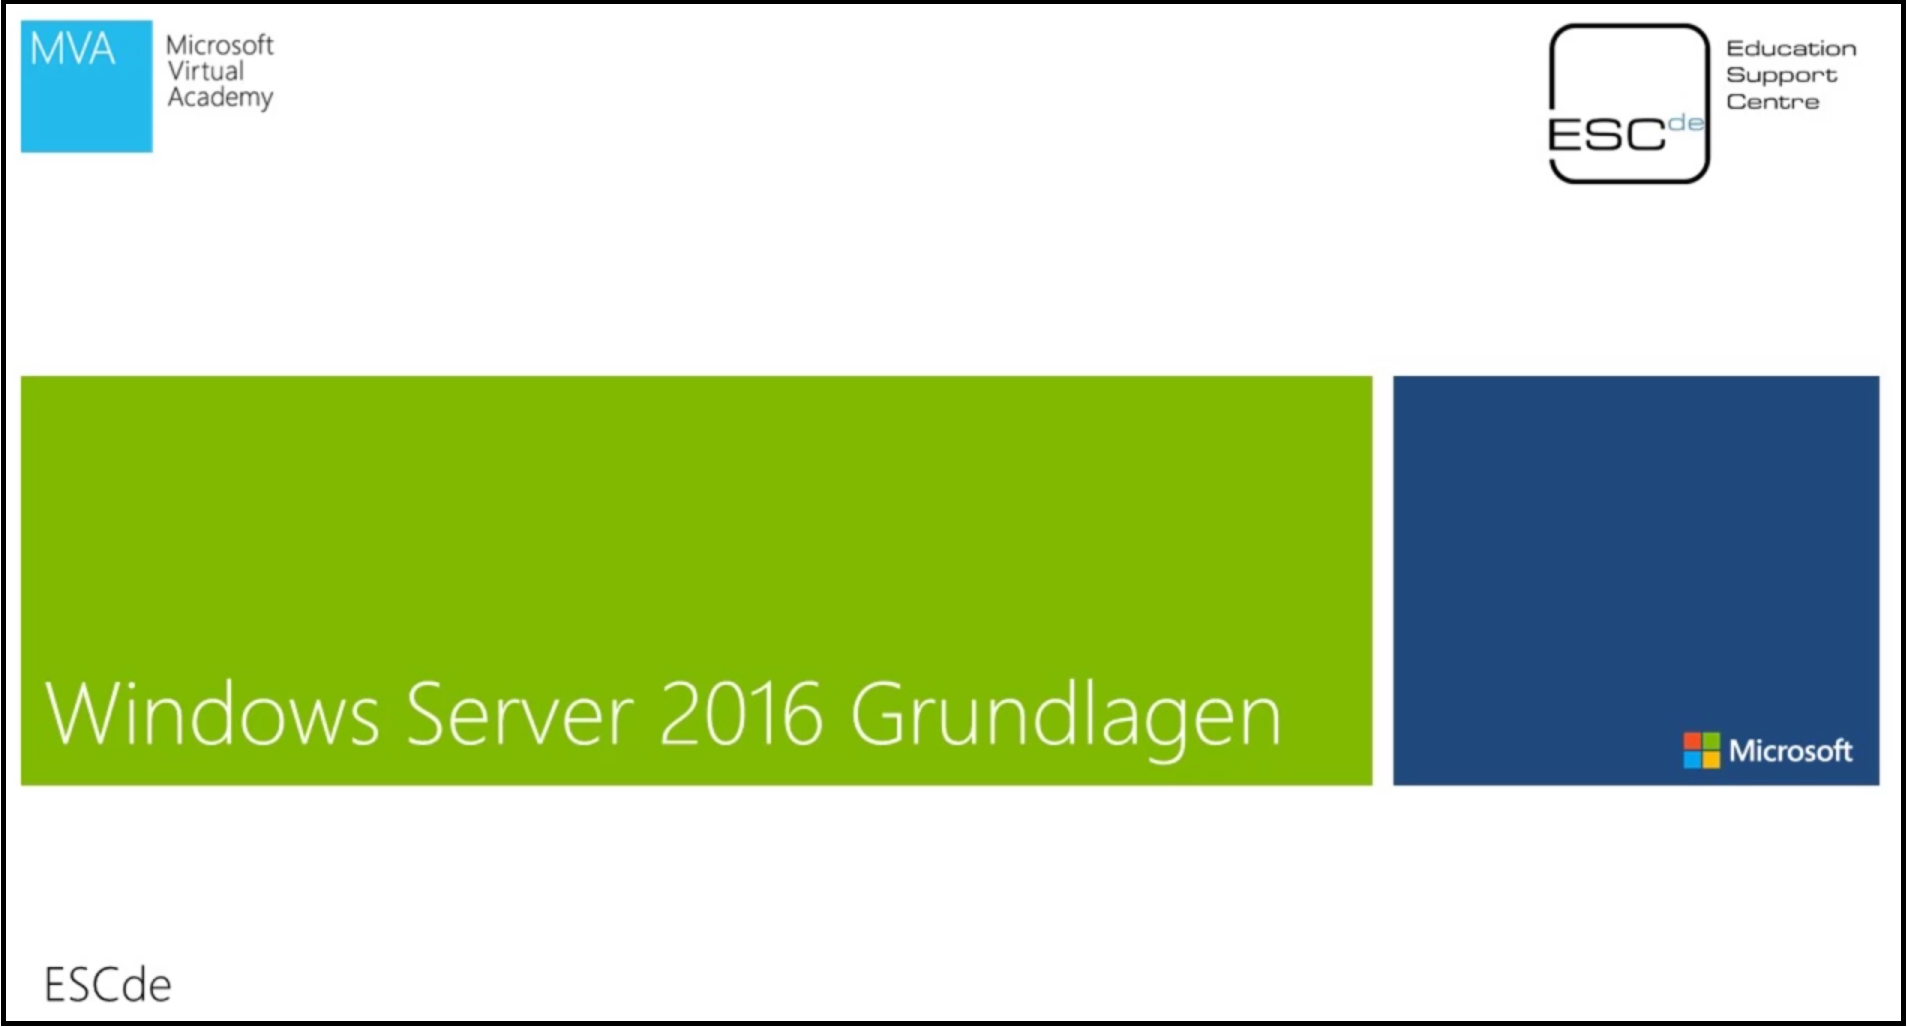 Windows Server 2016 rand.png